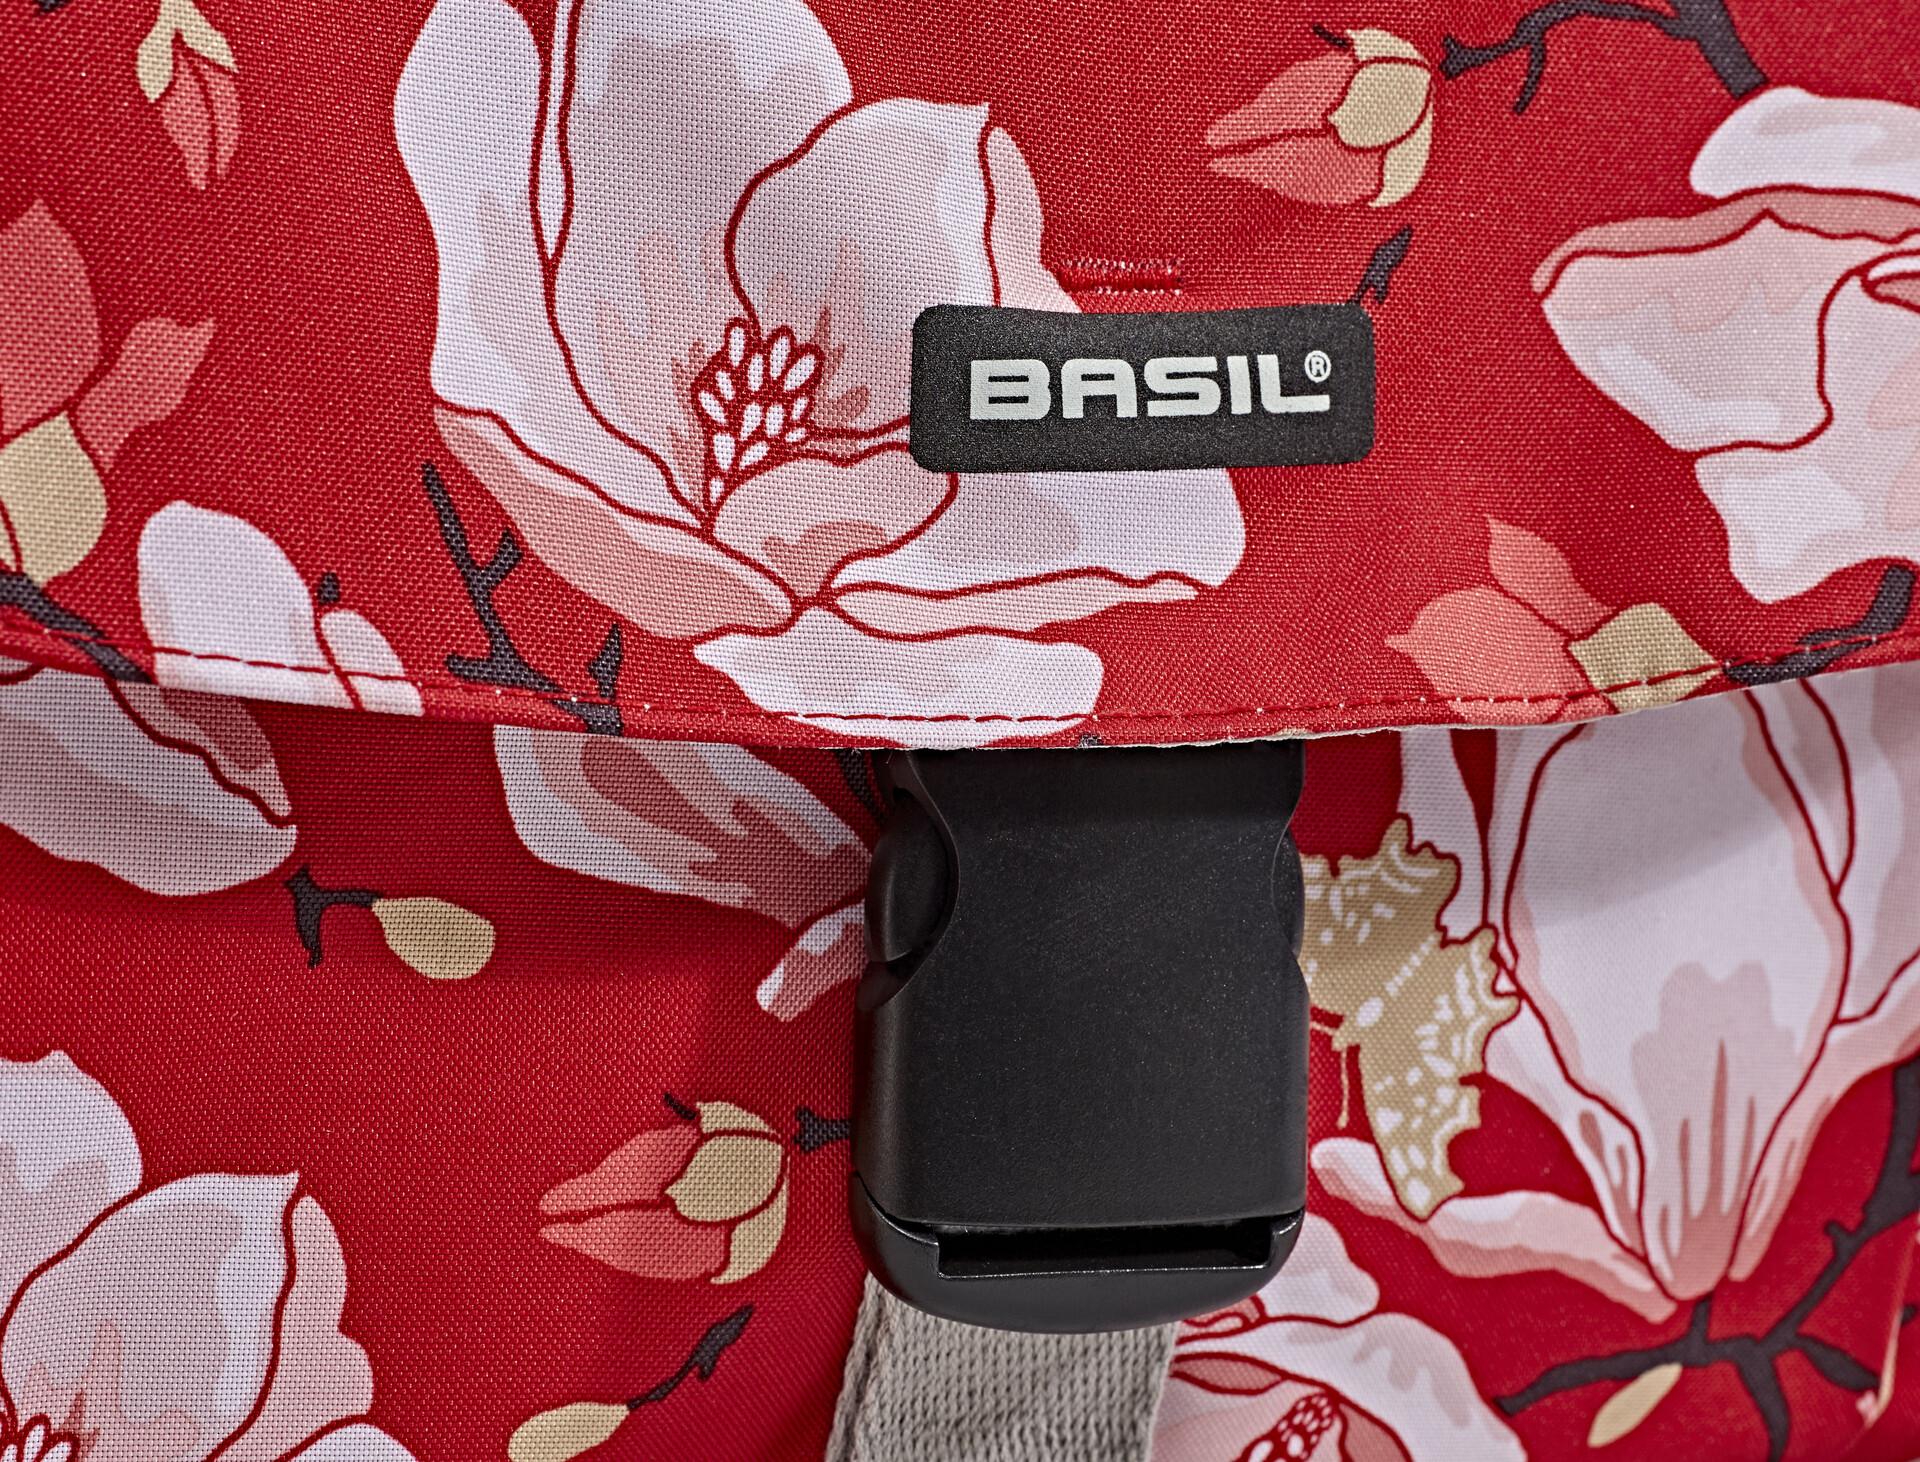 Basil Doppeltasche MAGNOLIA S DOUBLE BAG 25L poppy red Fahrrad